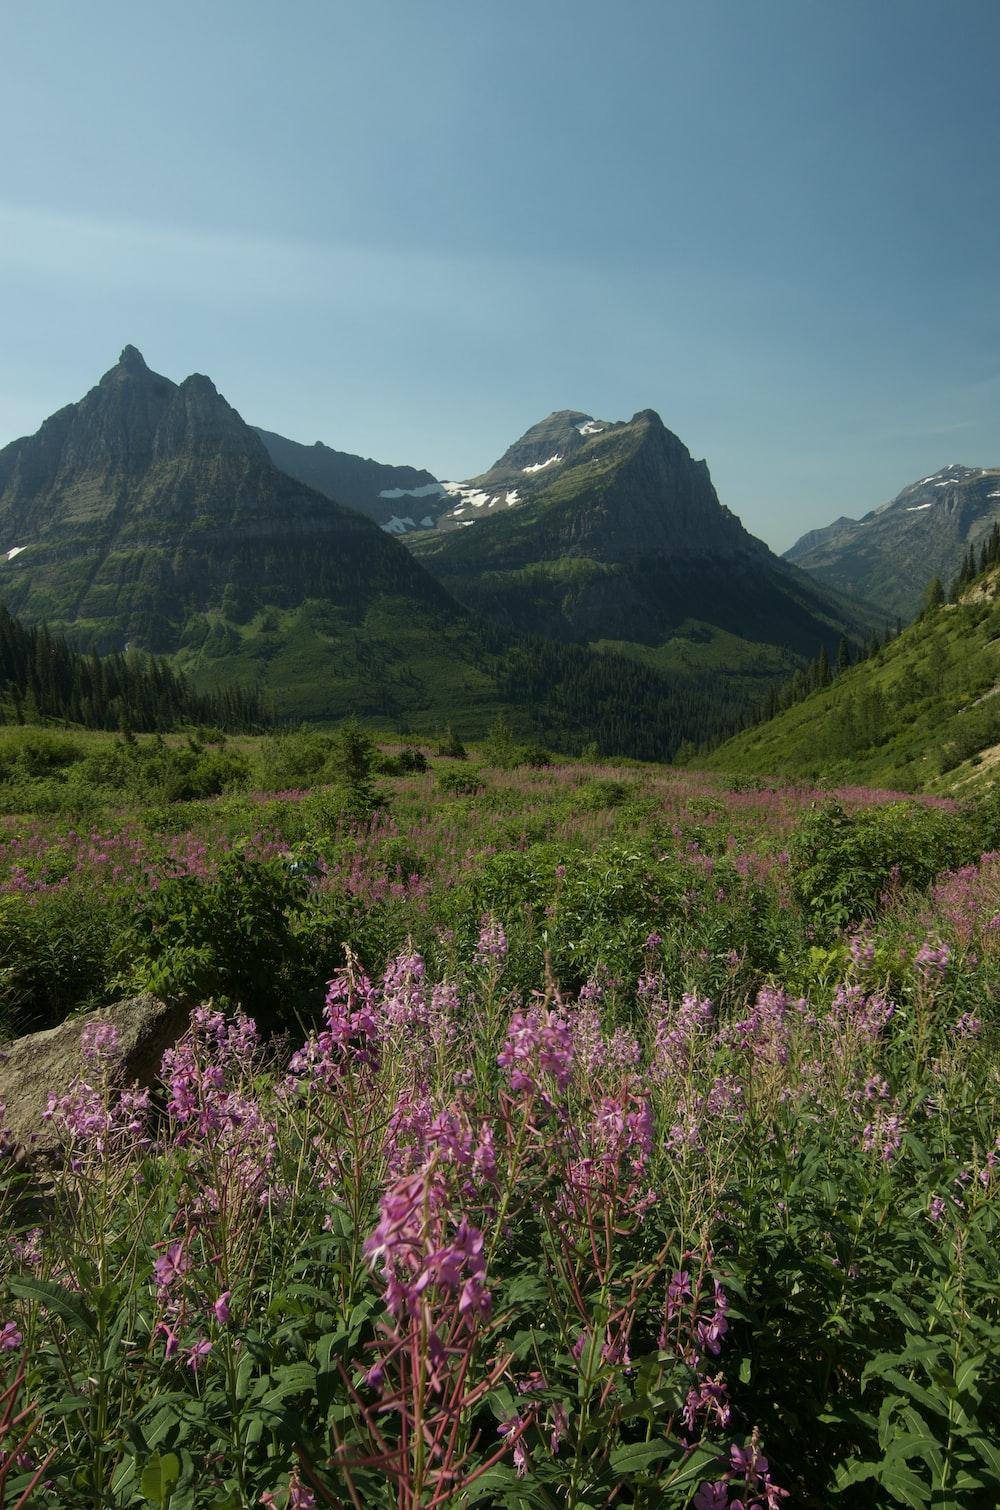 purple flower field near green mountains during daytime